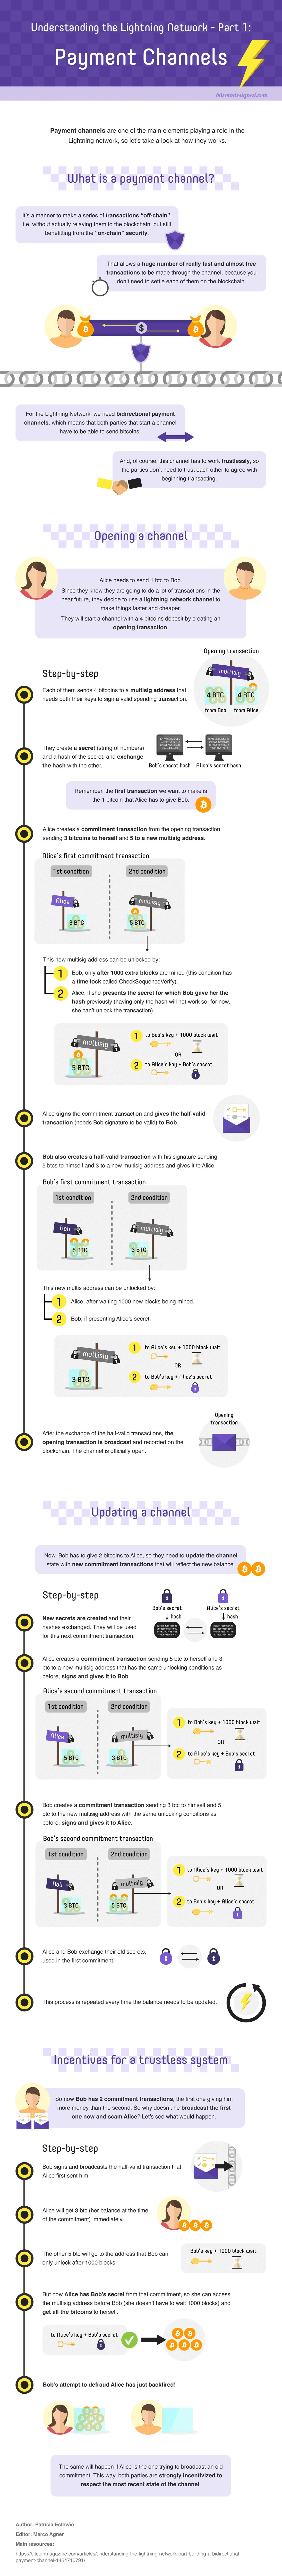 How Bitcoin Lightning Works Part 1